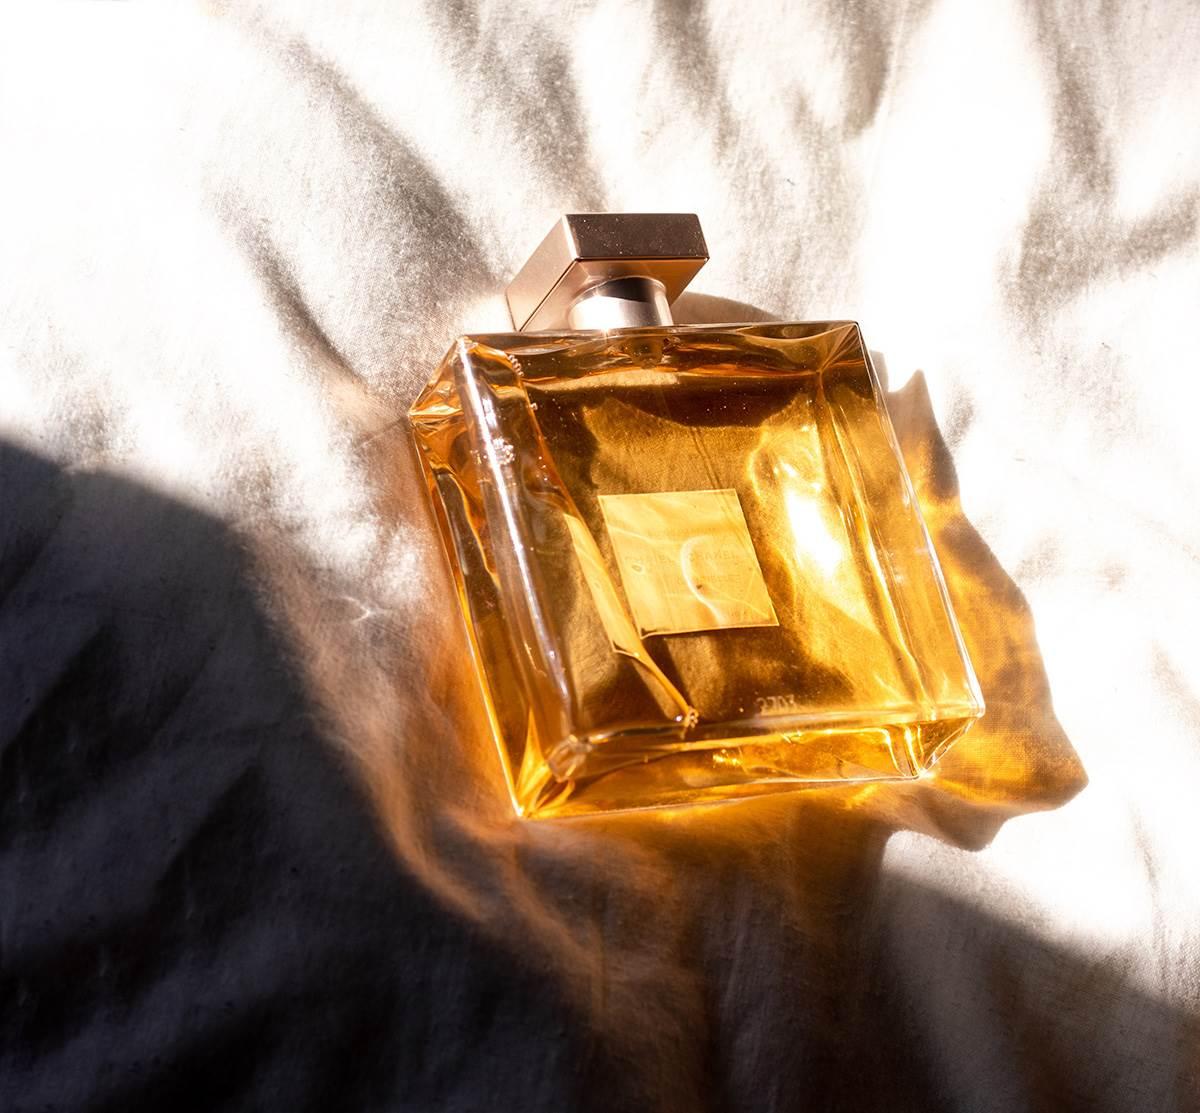 parfemi-onlajn-kupovina